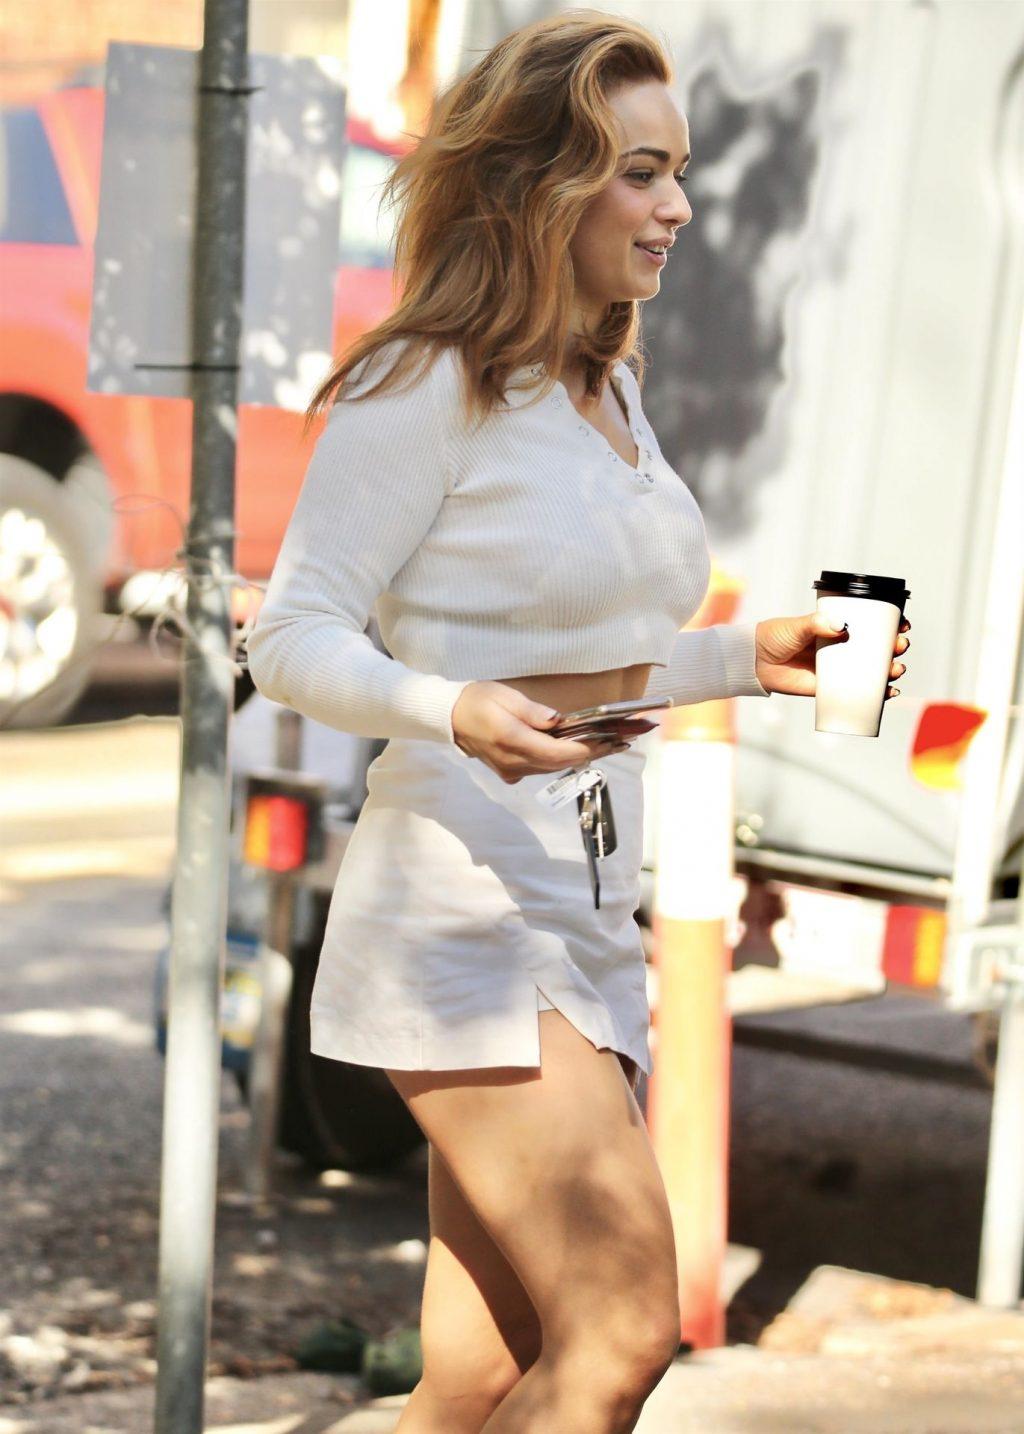 Abbie Chatfield Shows Off Her Sexy Legs in Brisbane (9 Photos)